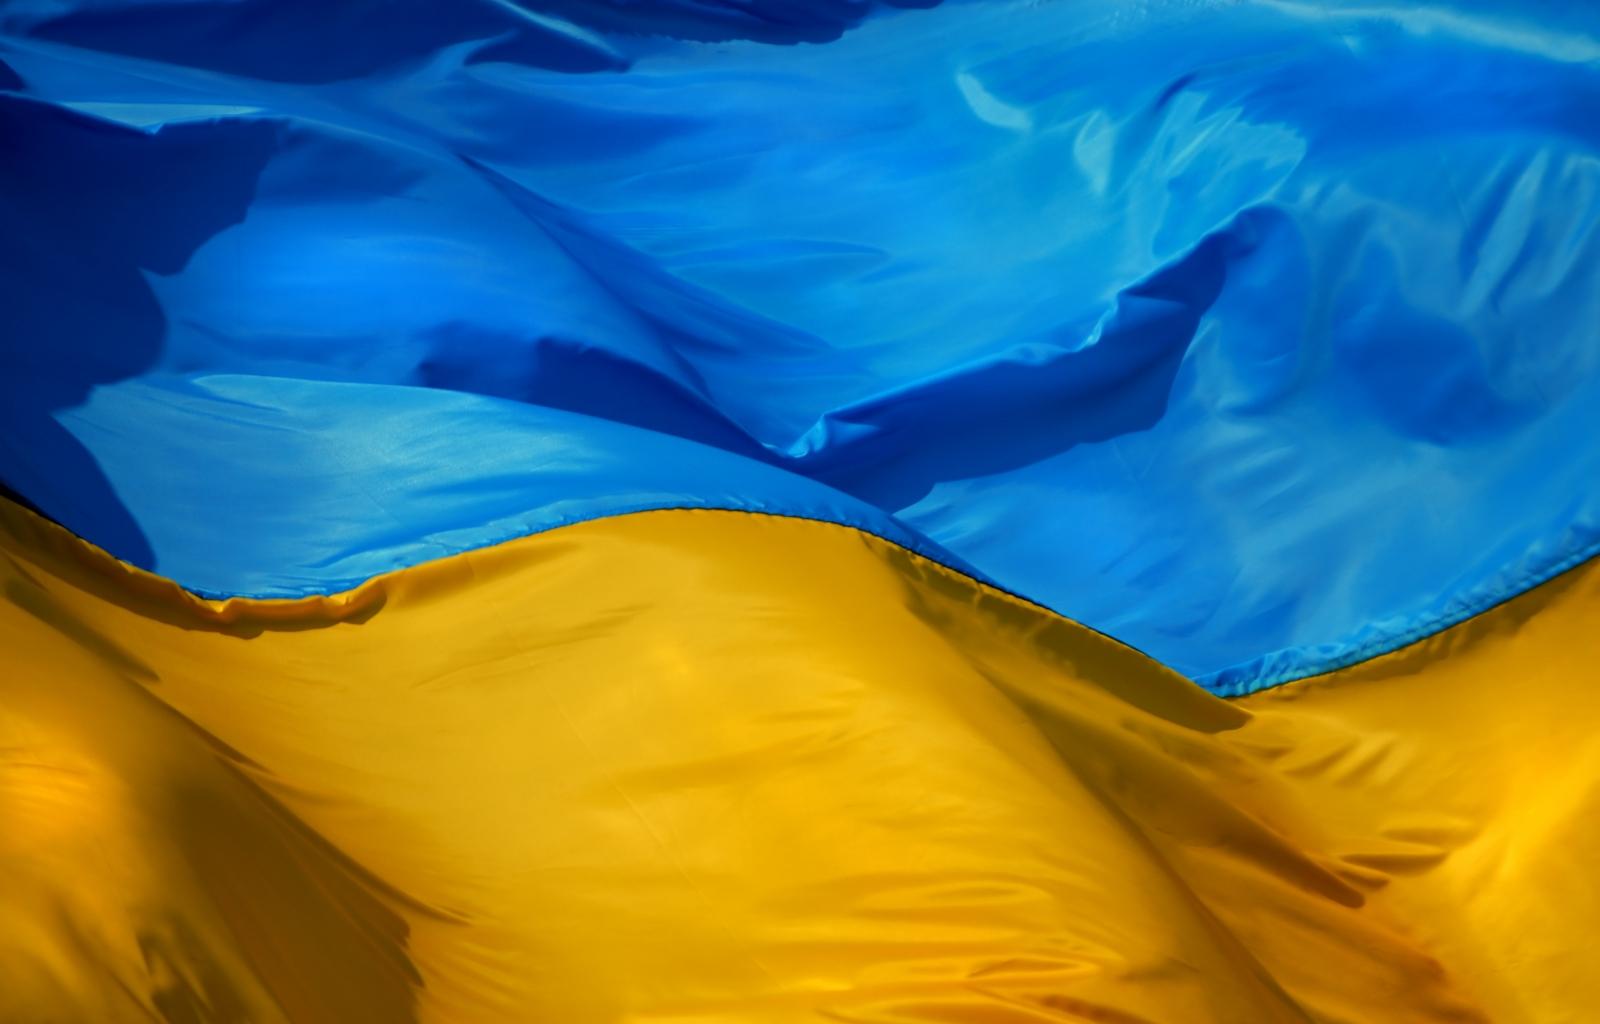 35878 Заставки и Обои Флаги на телефон. Скачать Флаги, Фон картинки бесплатно